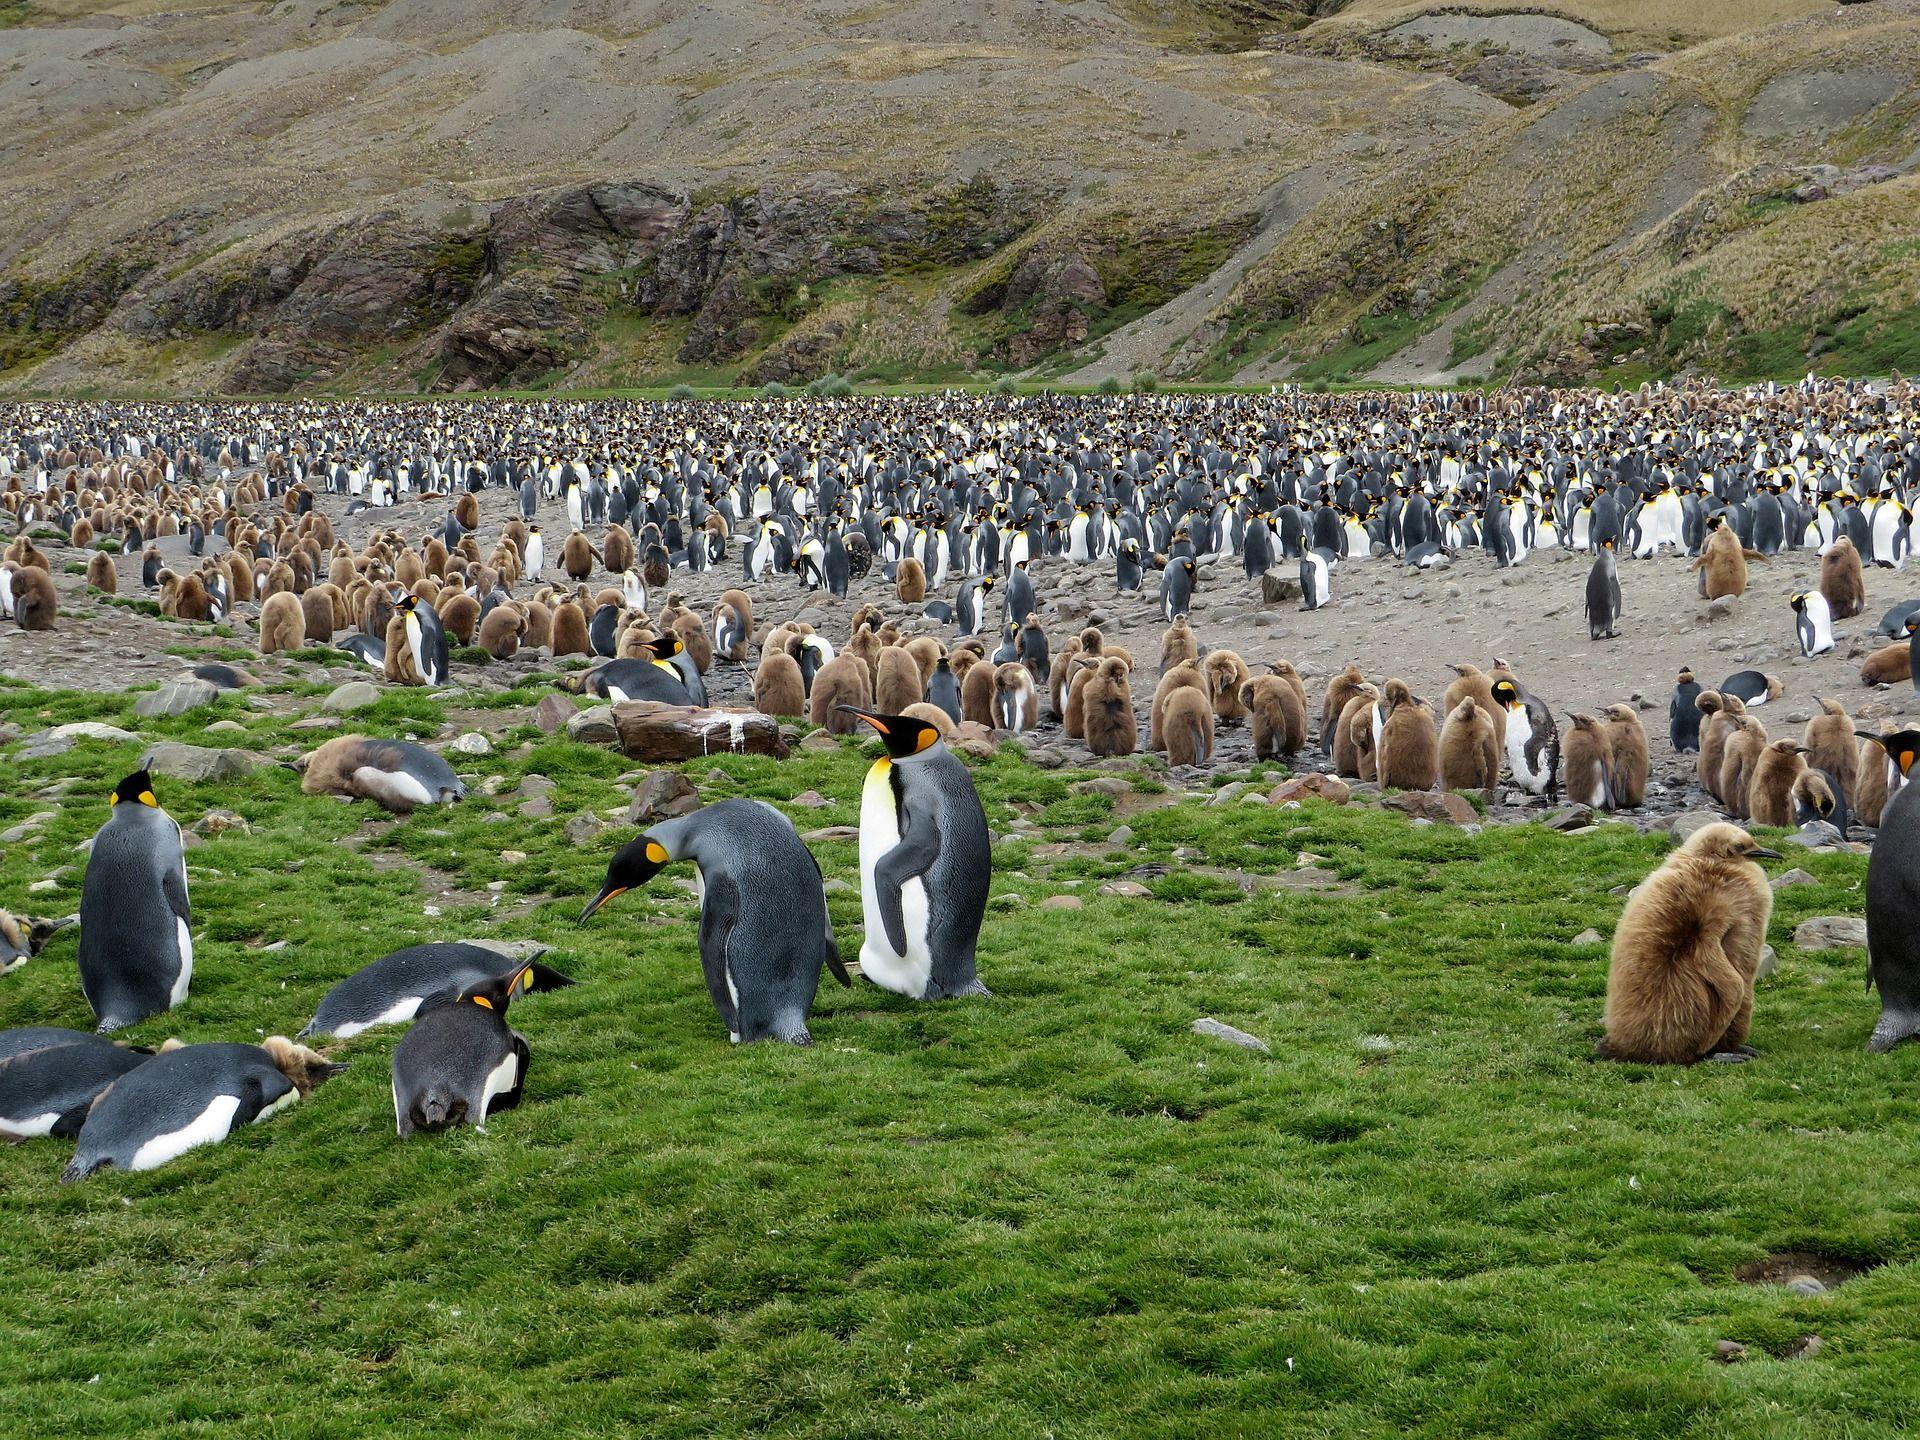 Riesiger Eisberg bedroht Pinguin-Kolonien